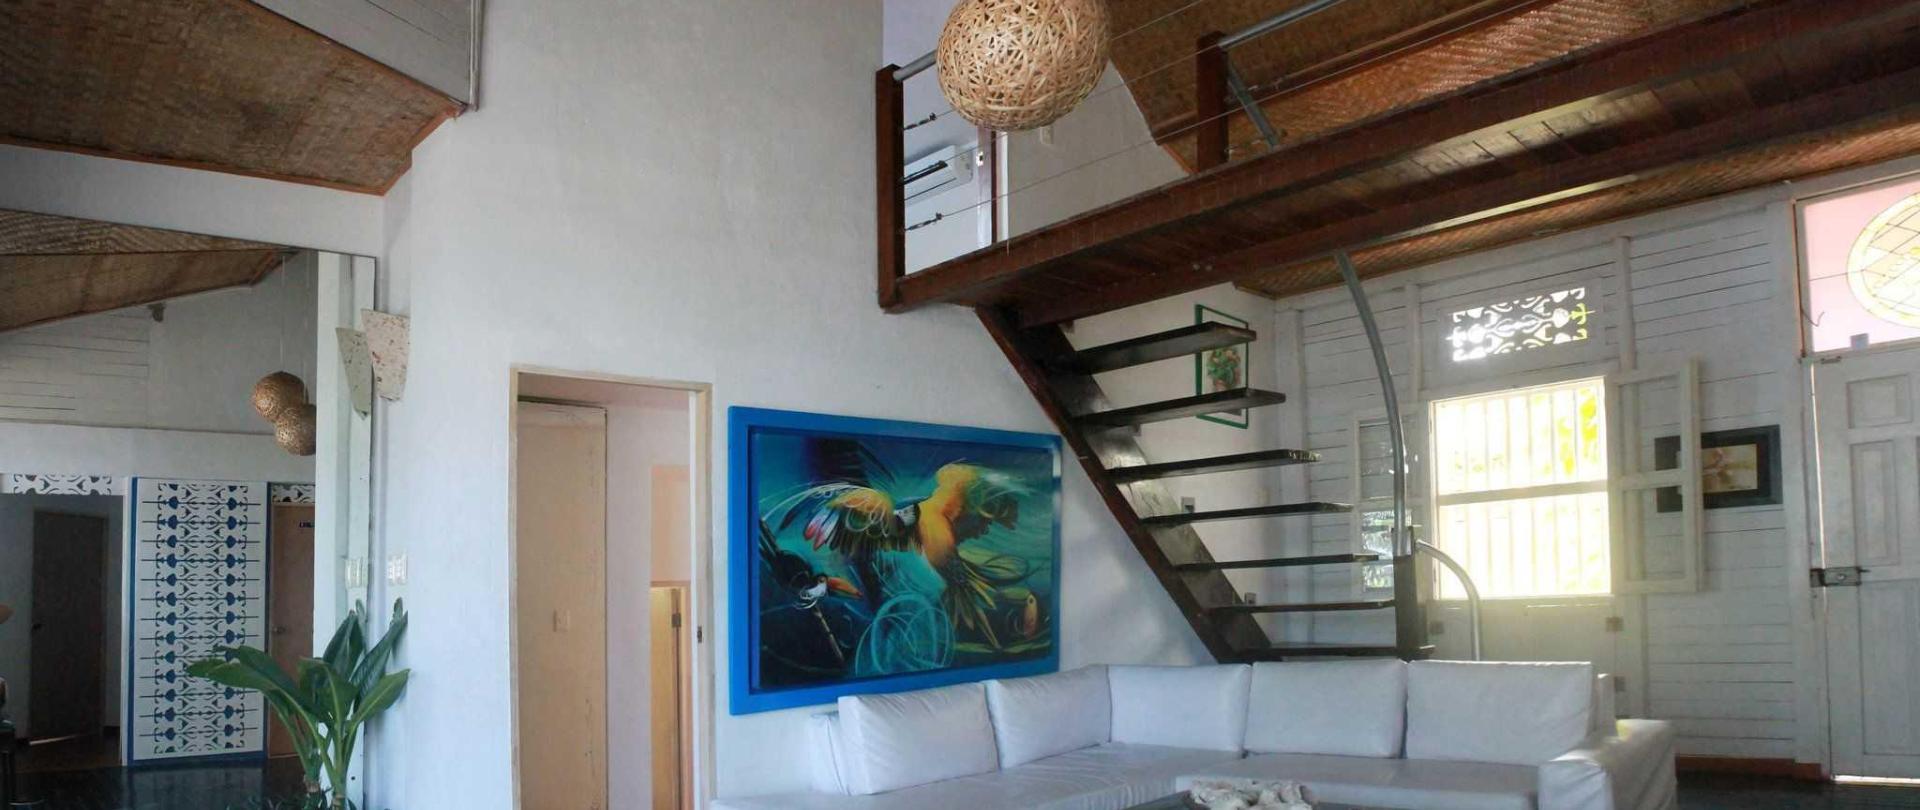 lobby-auaecoco-1.jpg